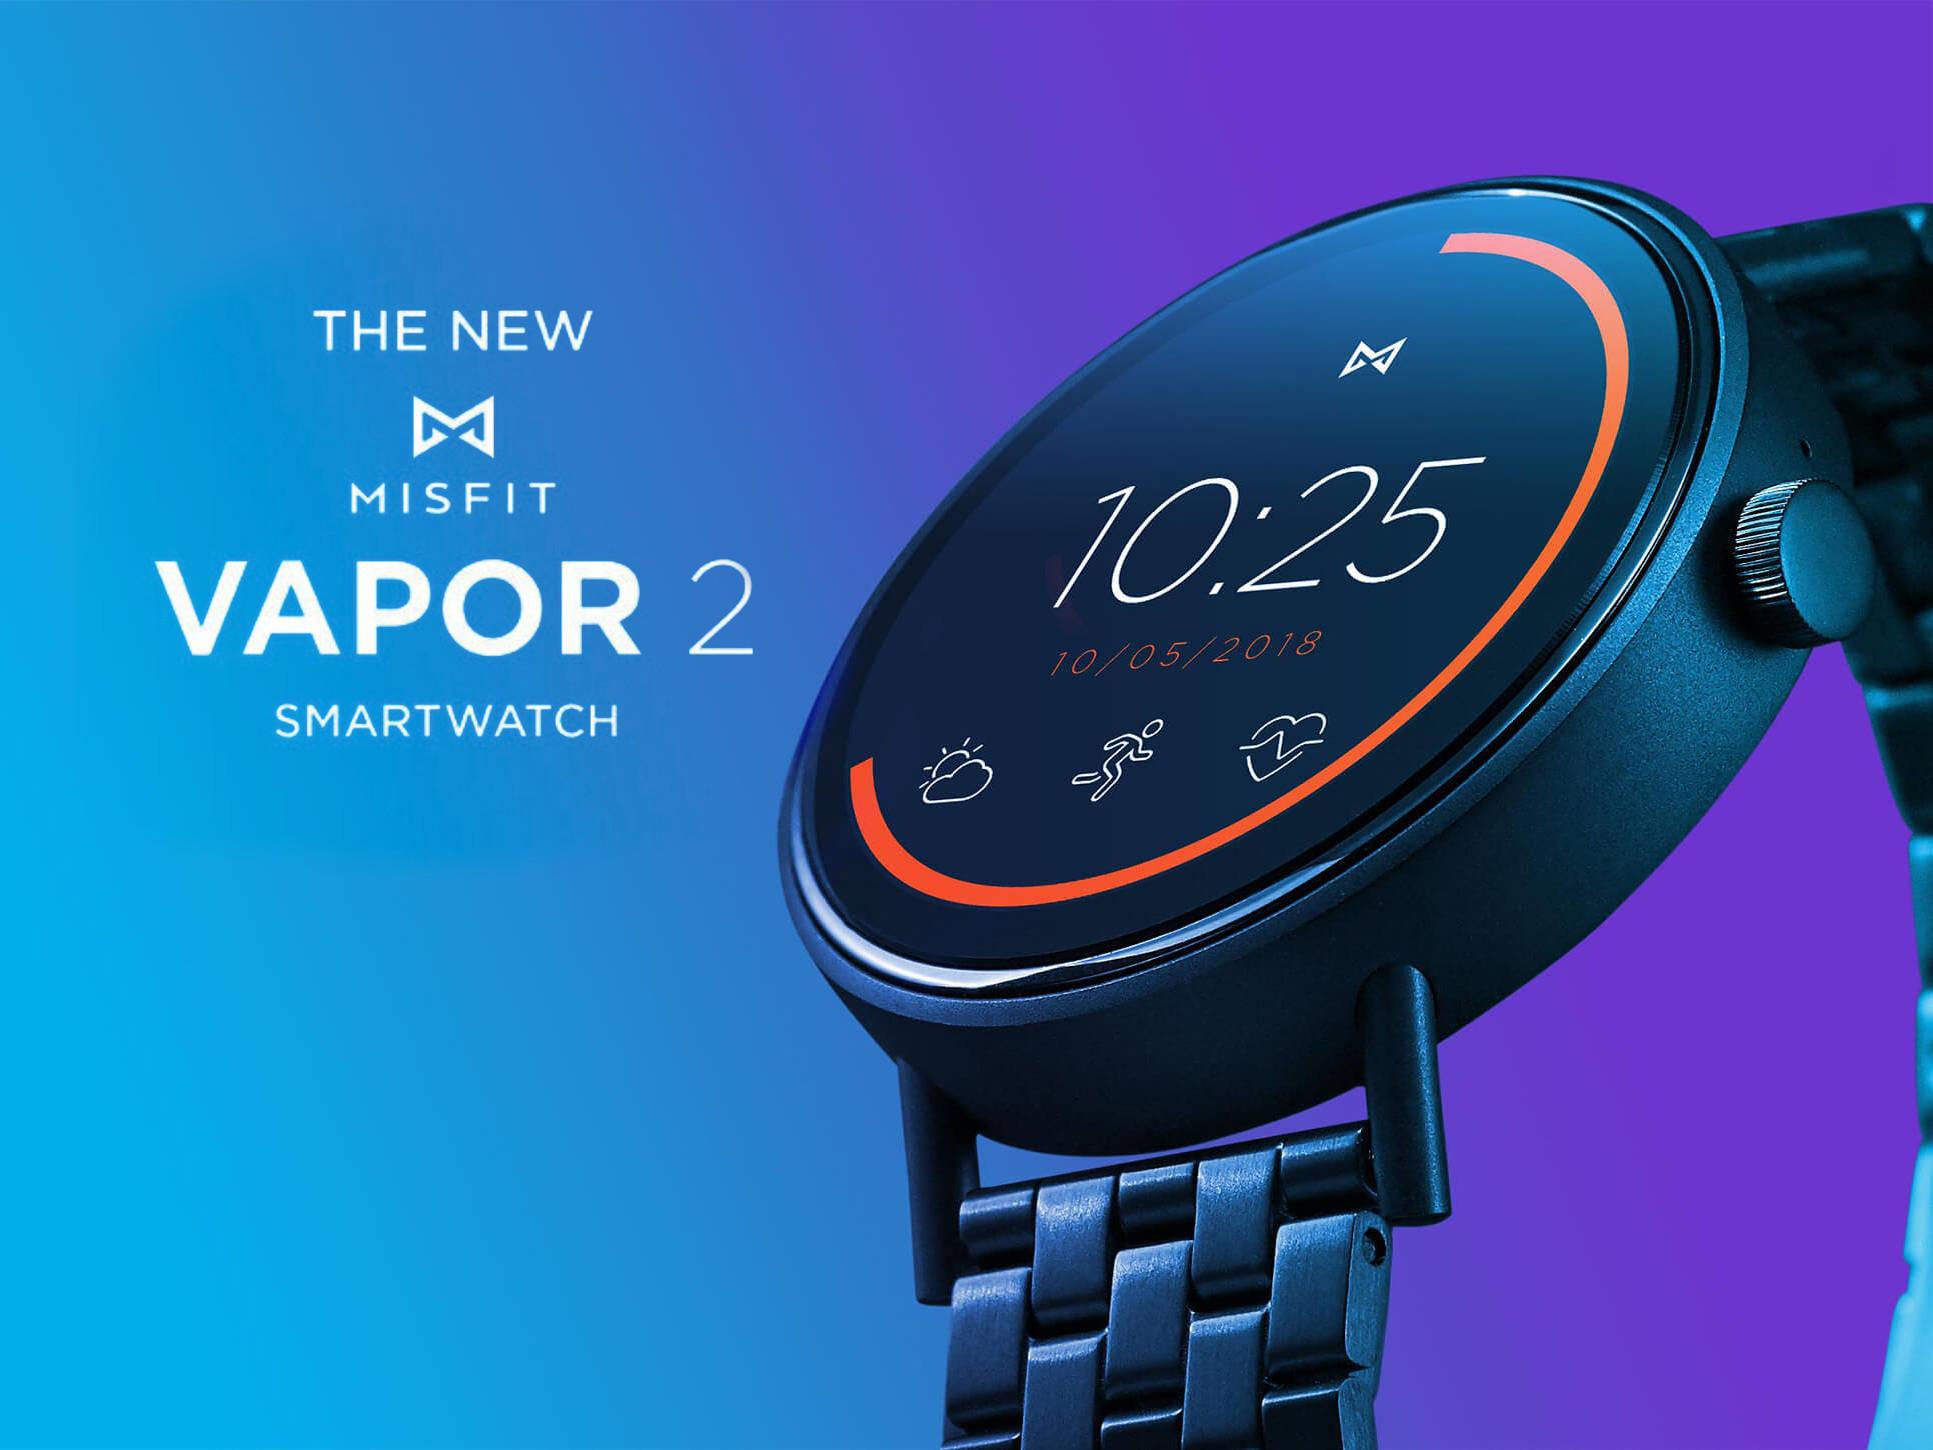 Misfit Vapor 2 Wear Os Smartwatch Kommt Mit Rundem Amoled Display Integriertem Gps Und Nfc Notebookcheck Com News